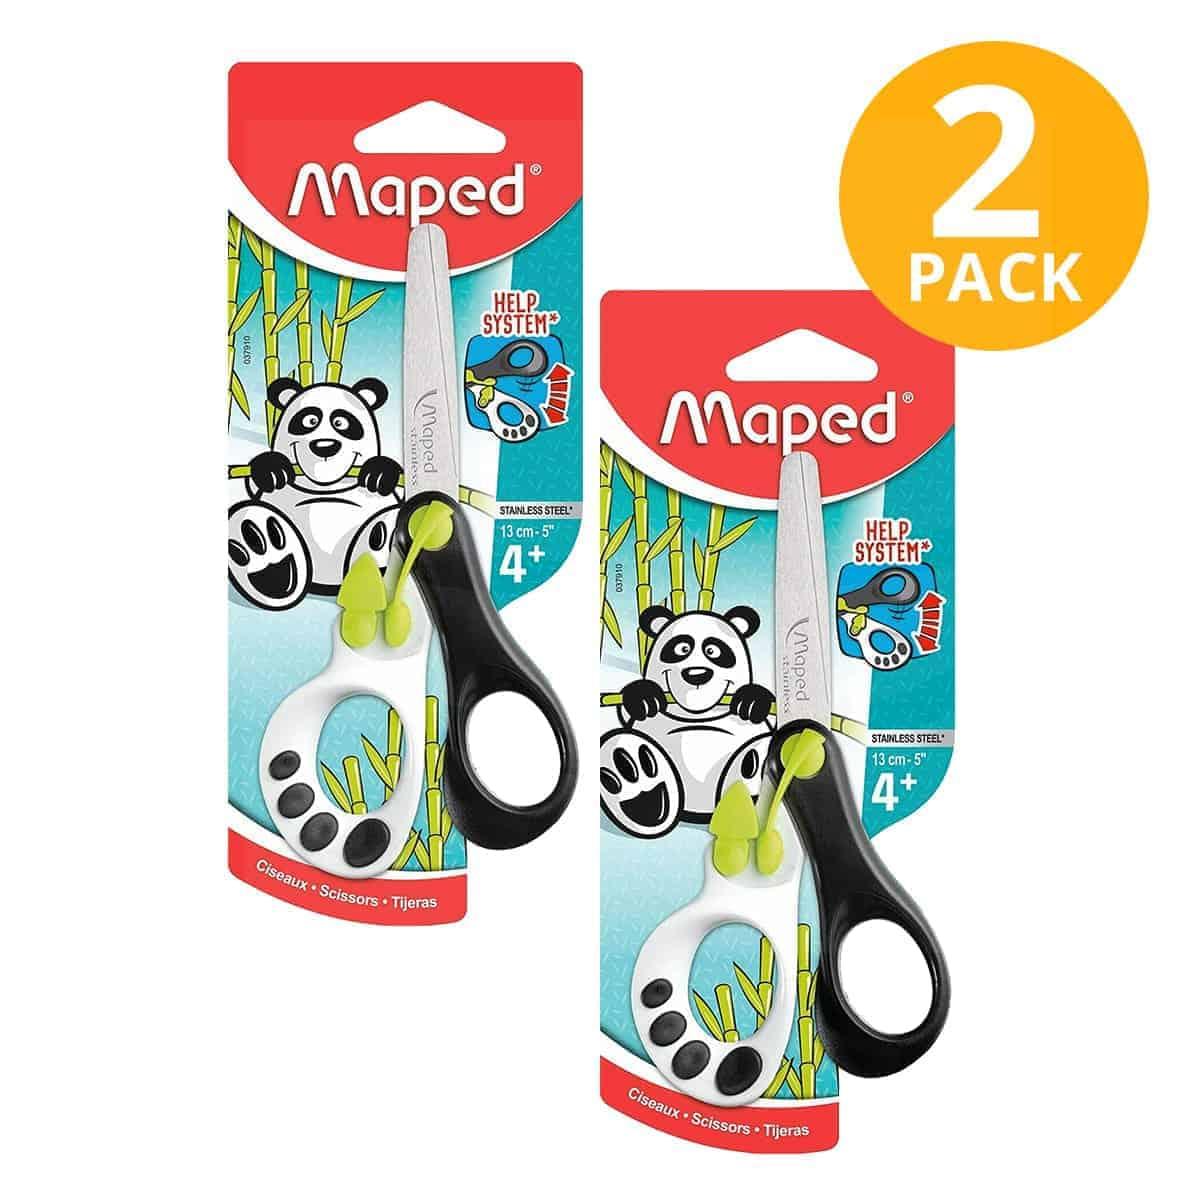 Maped, Tijeras para Niños Koopy, 13 cm (Pack de 2)